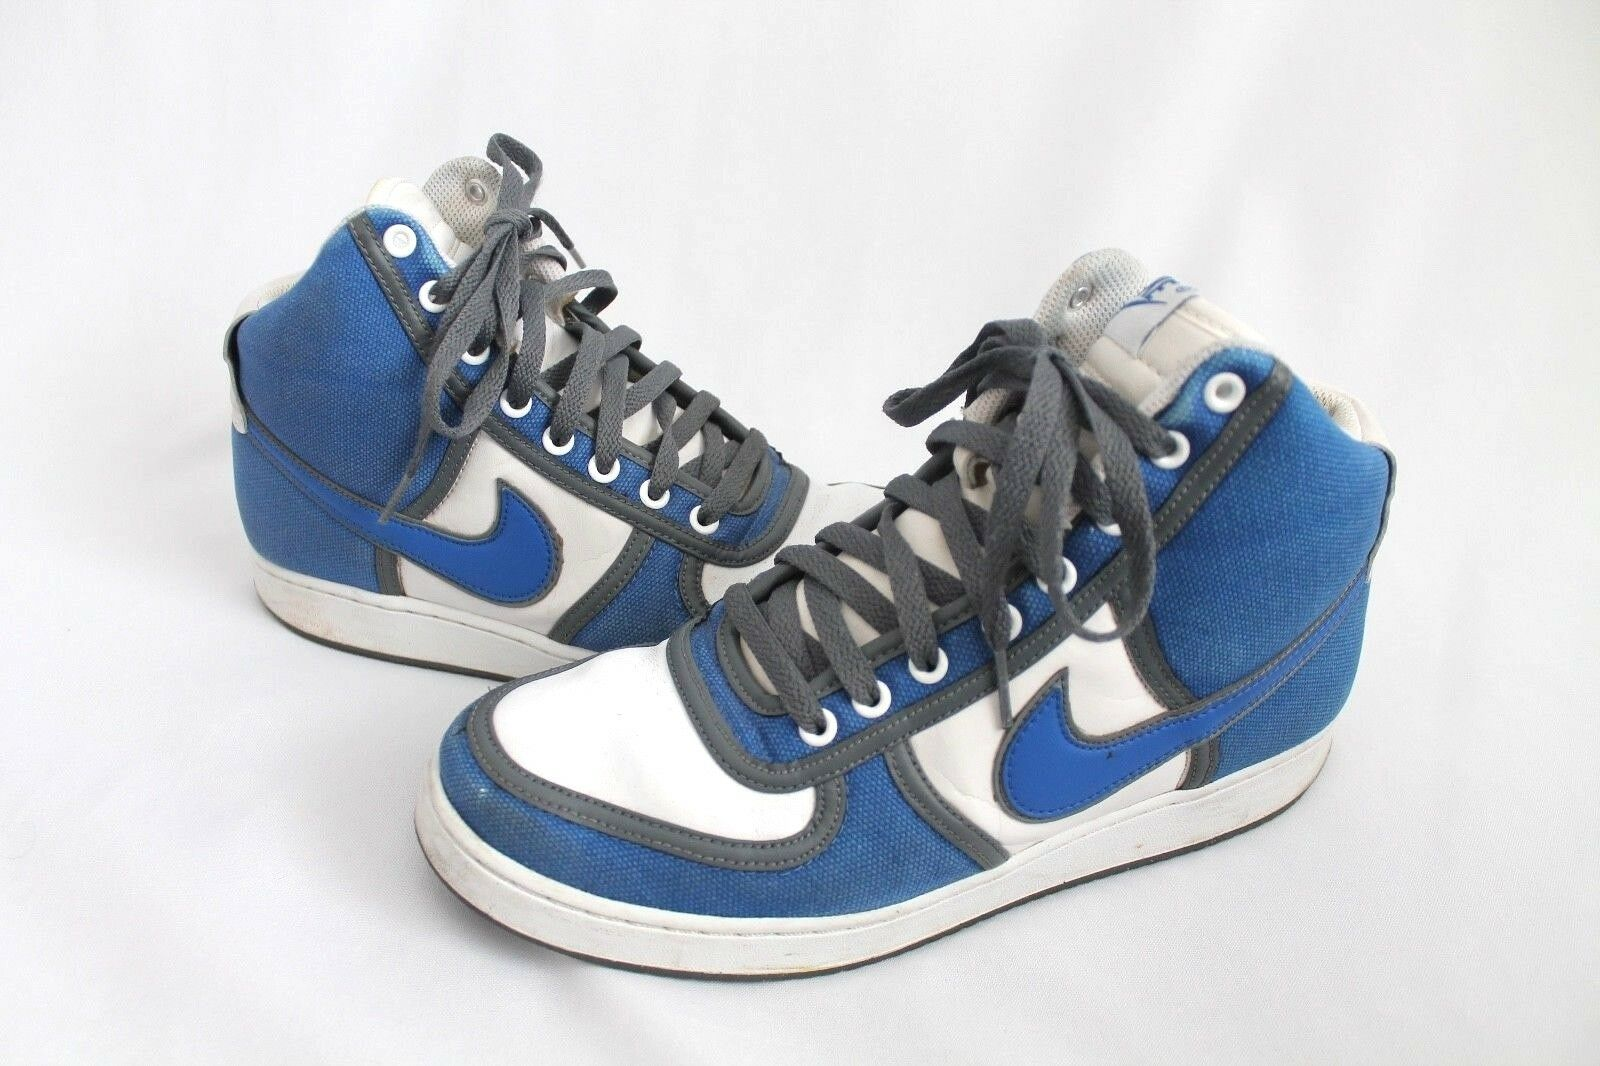 NIKE Basketball sneakers Shoes hi top men's Comfortable Brand discount